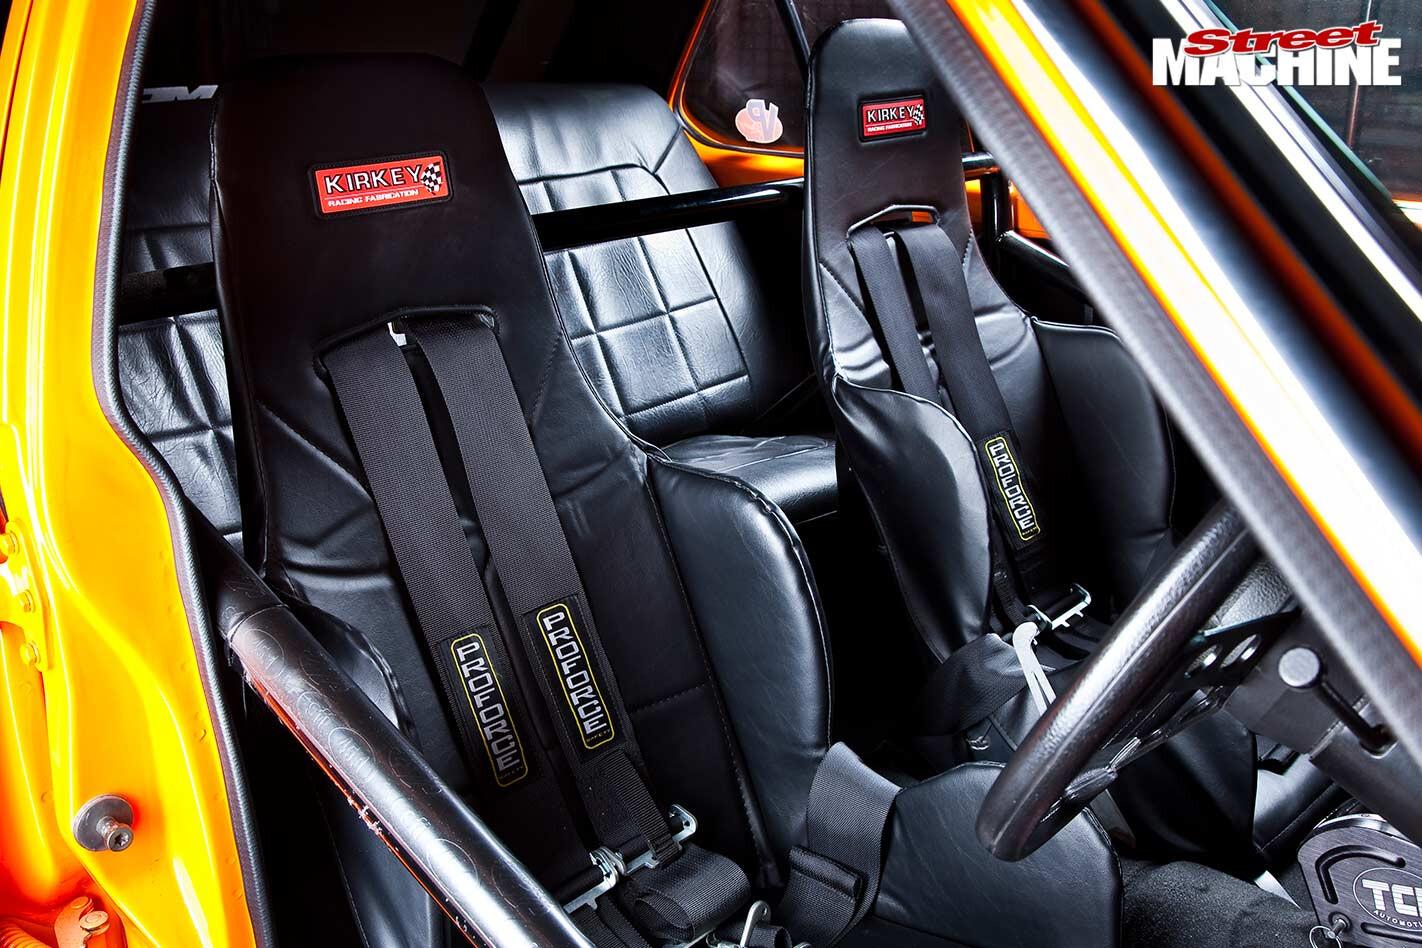 Holden LH Torana seats